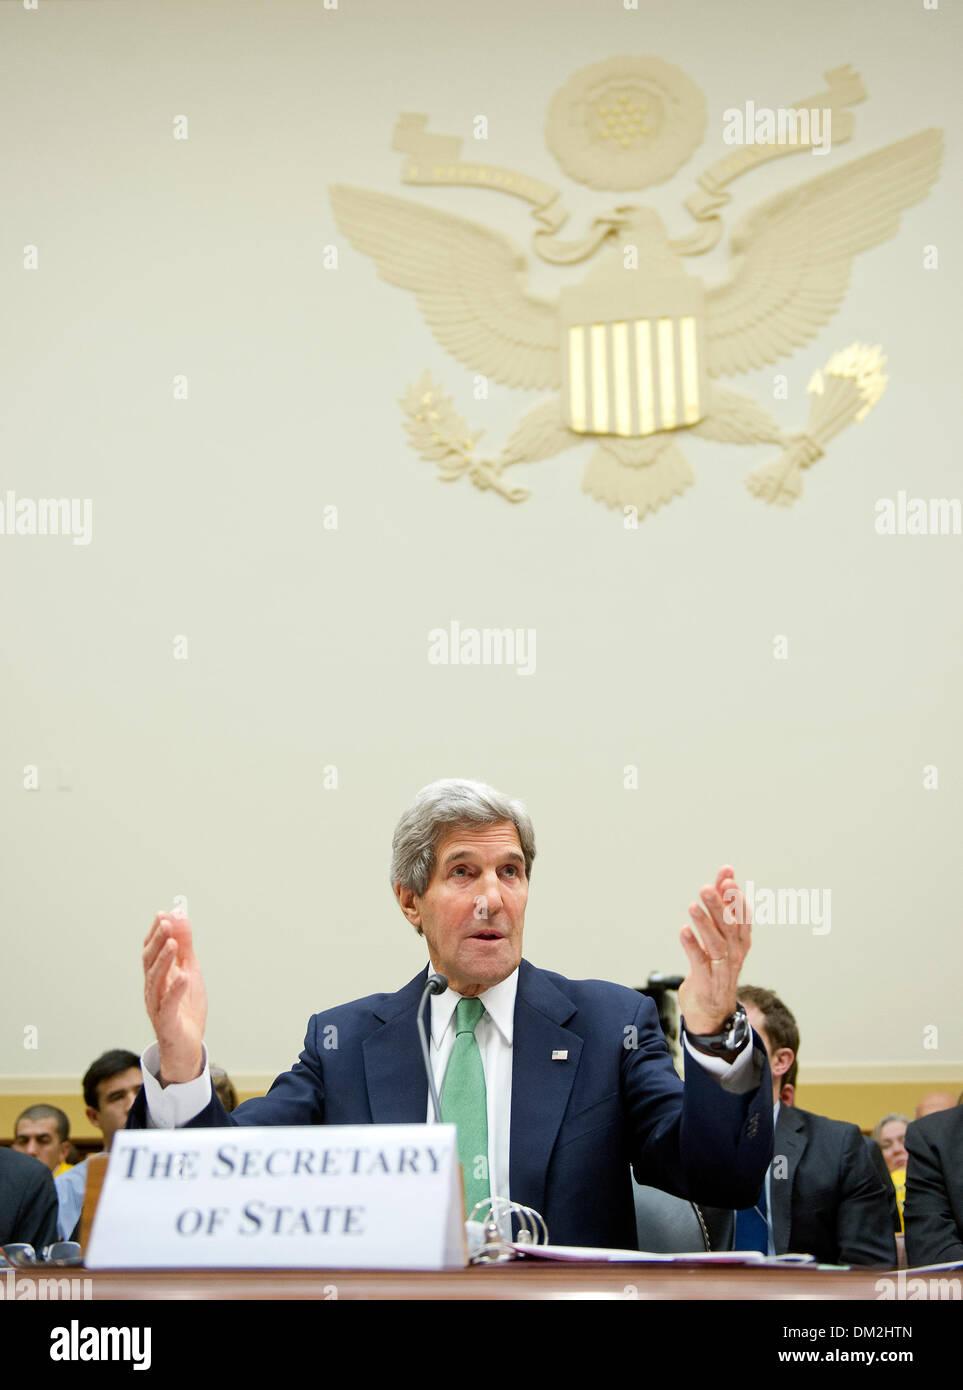 Washington DC, USA. 11th Dec, 2013. United States Secretary of State John F. Kerry testifies before the U.S. House Stock Photo